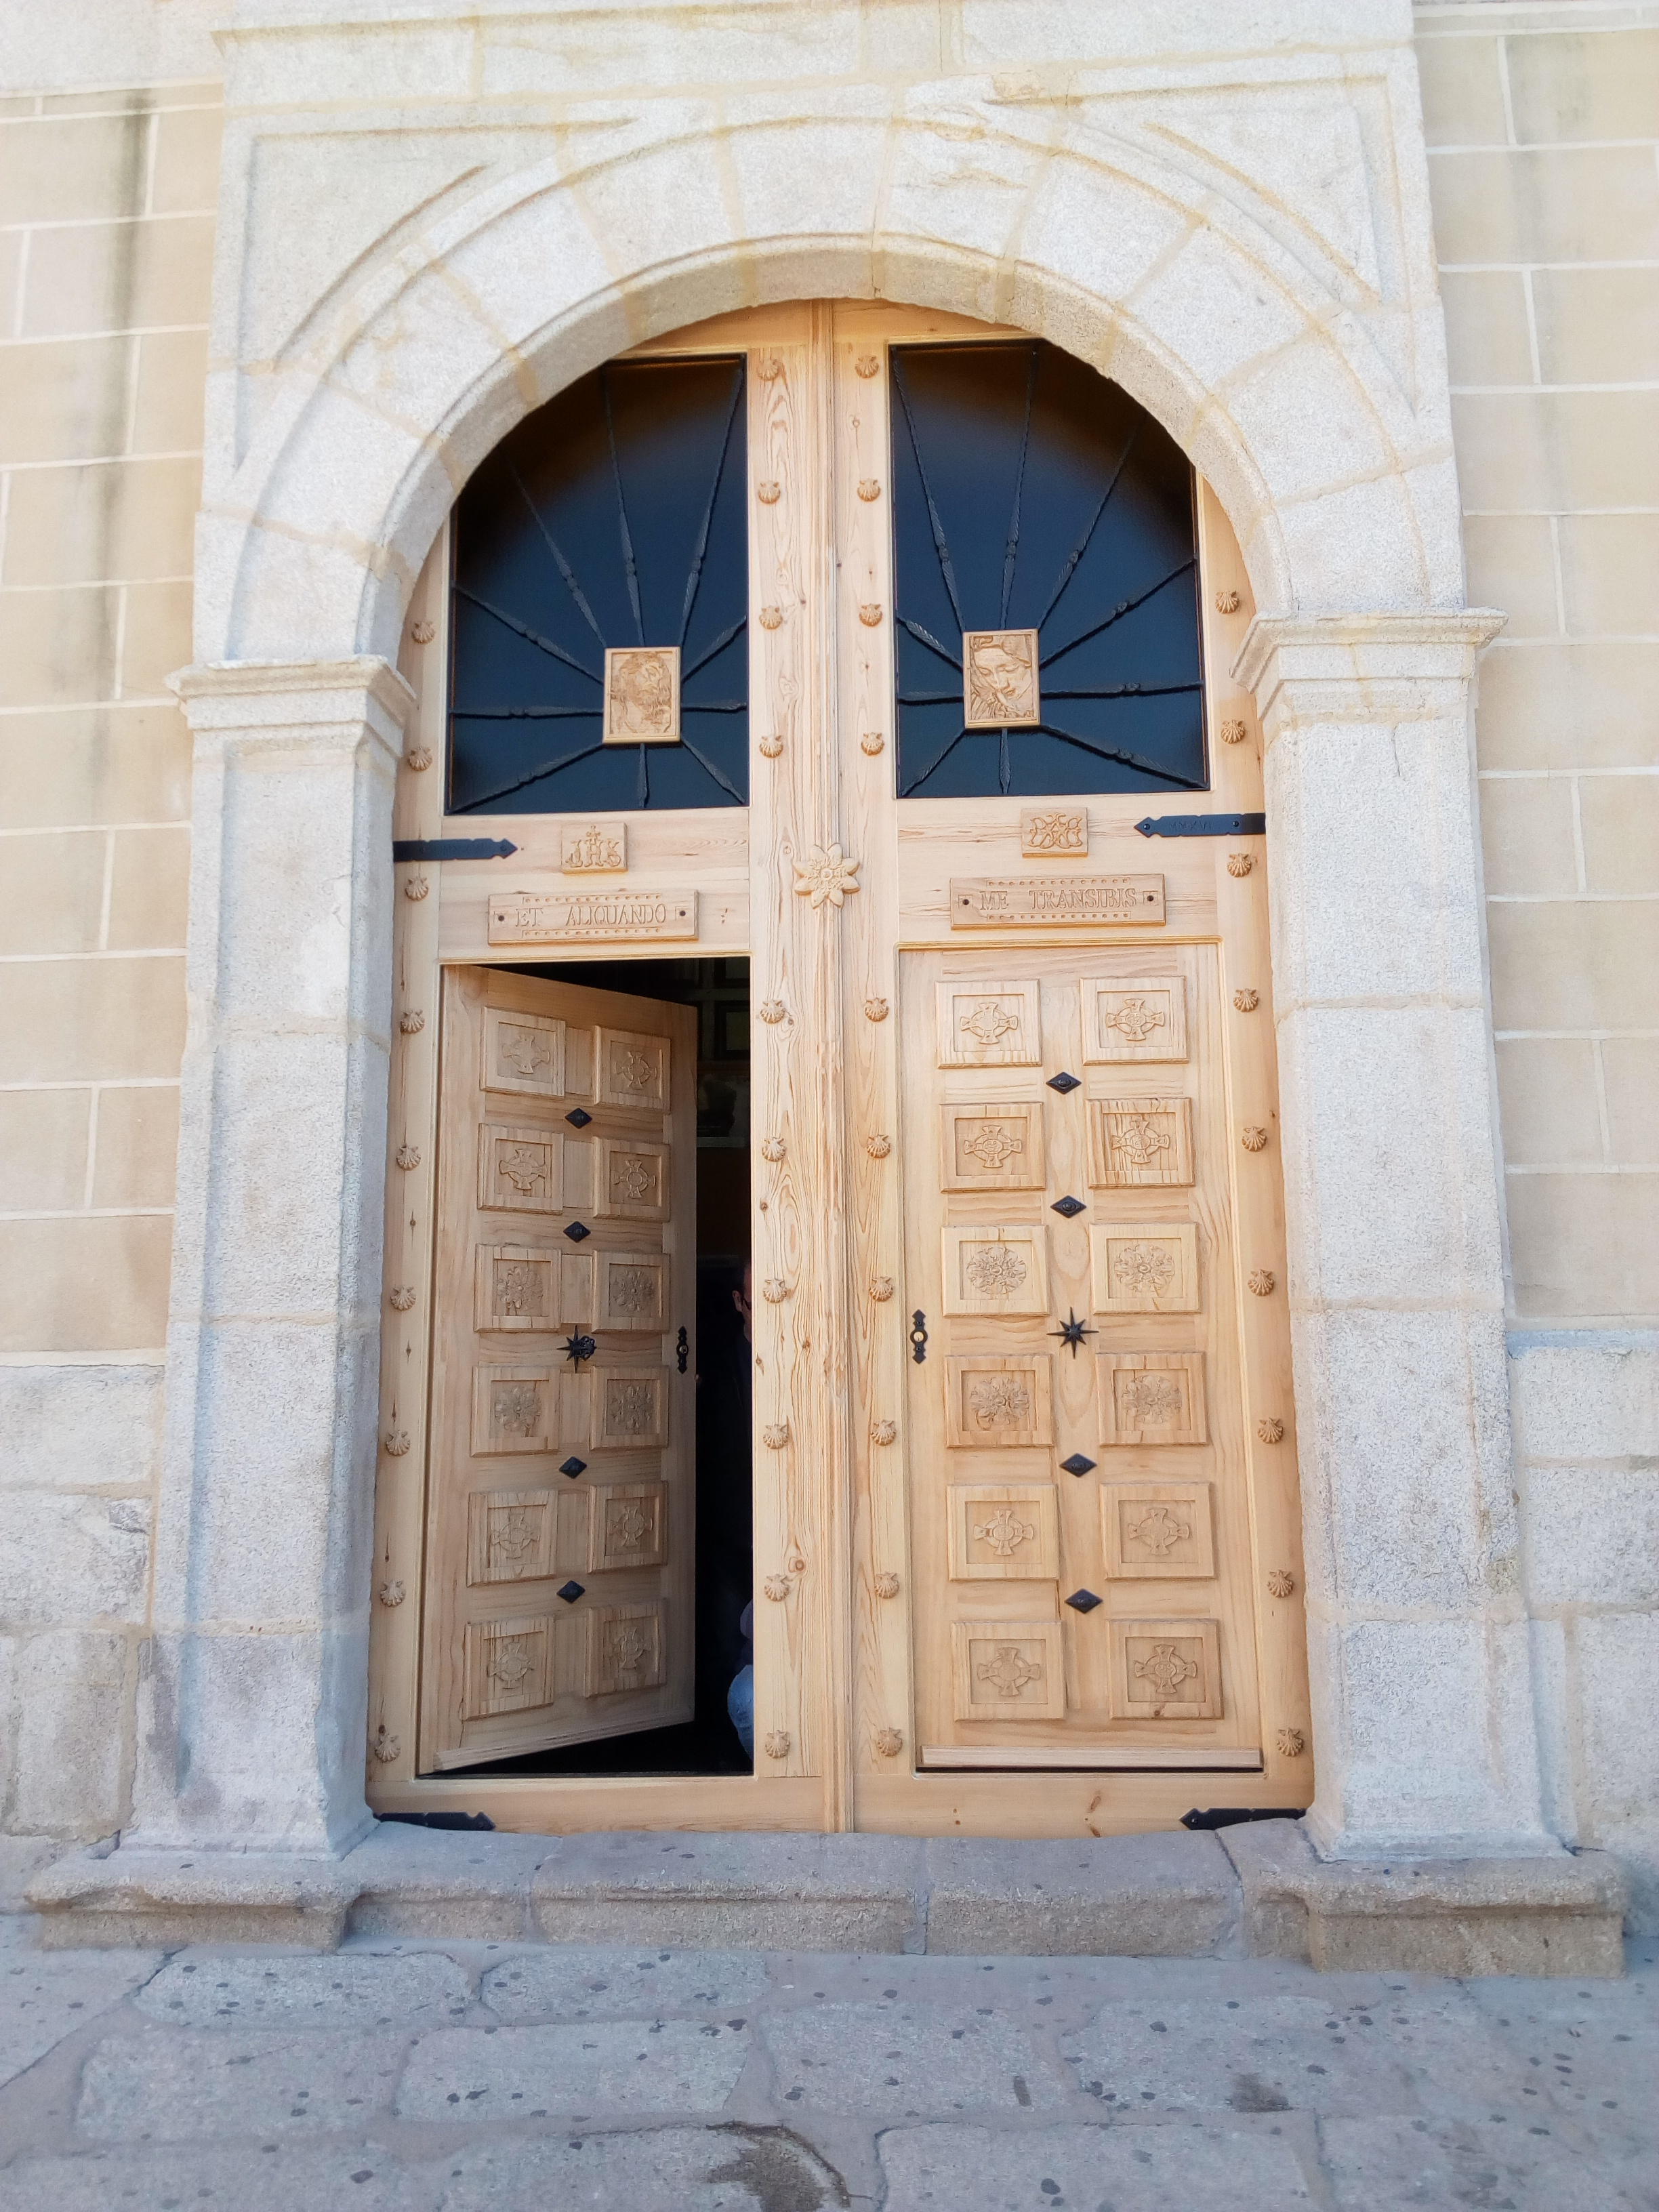 La nueva puerta de la Iglesia de San Andrés Apóstol ya está instalada